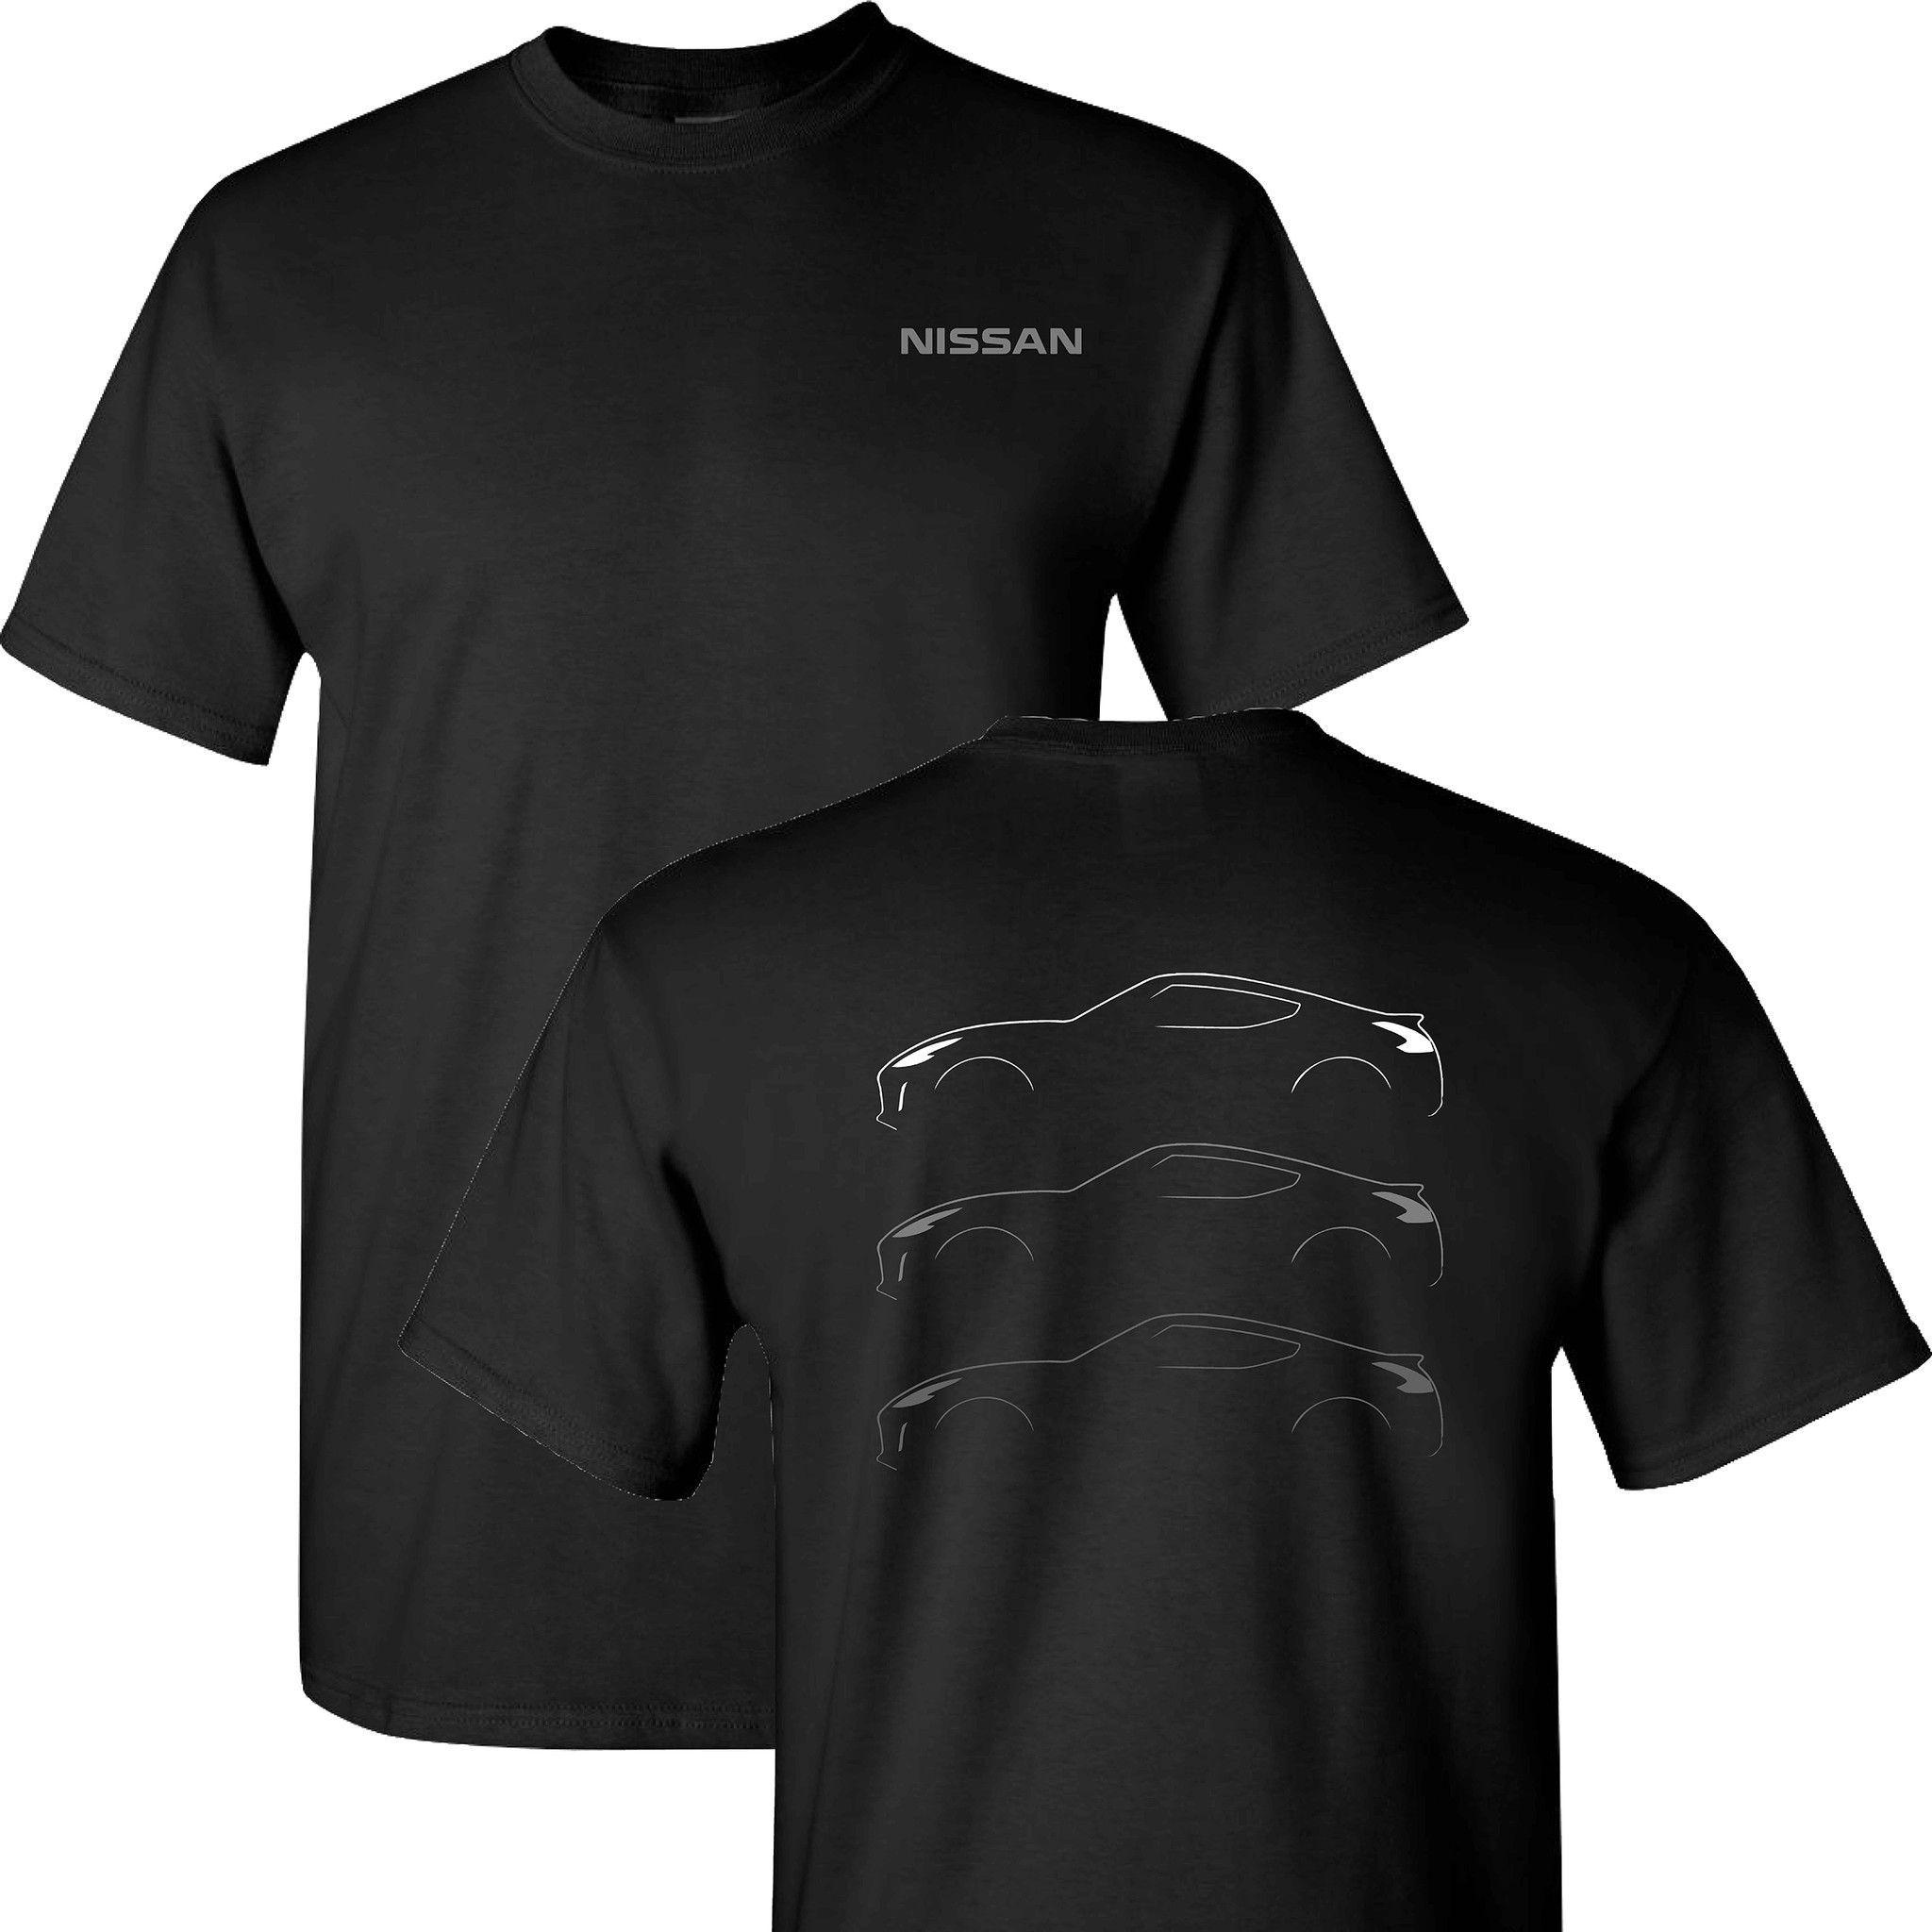 Nissan Z Silohuette on a Black T Shirt